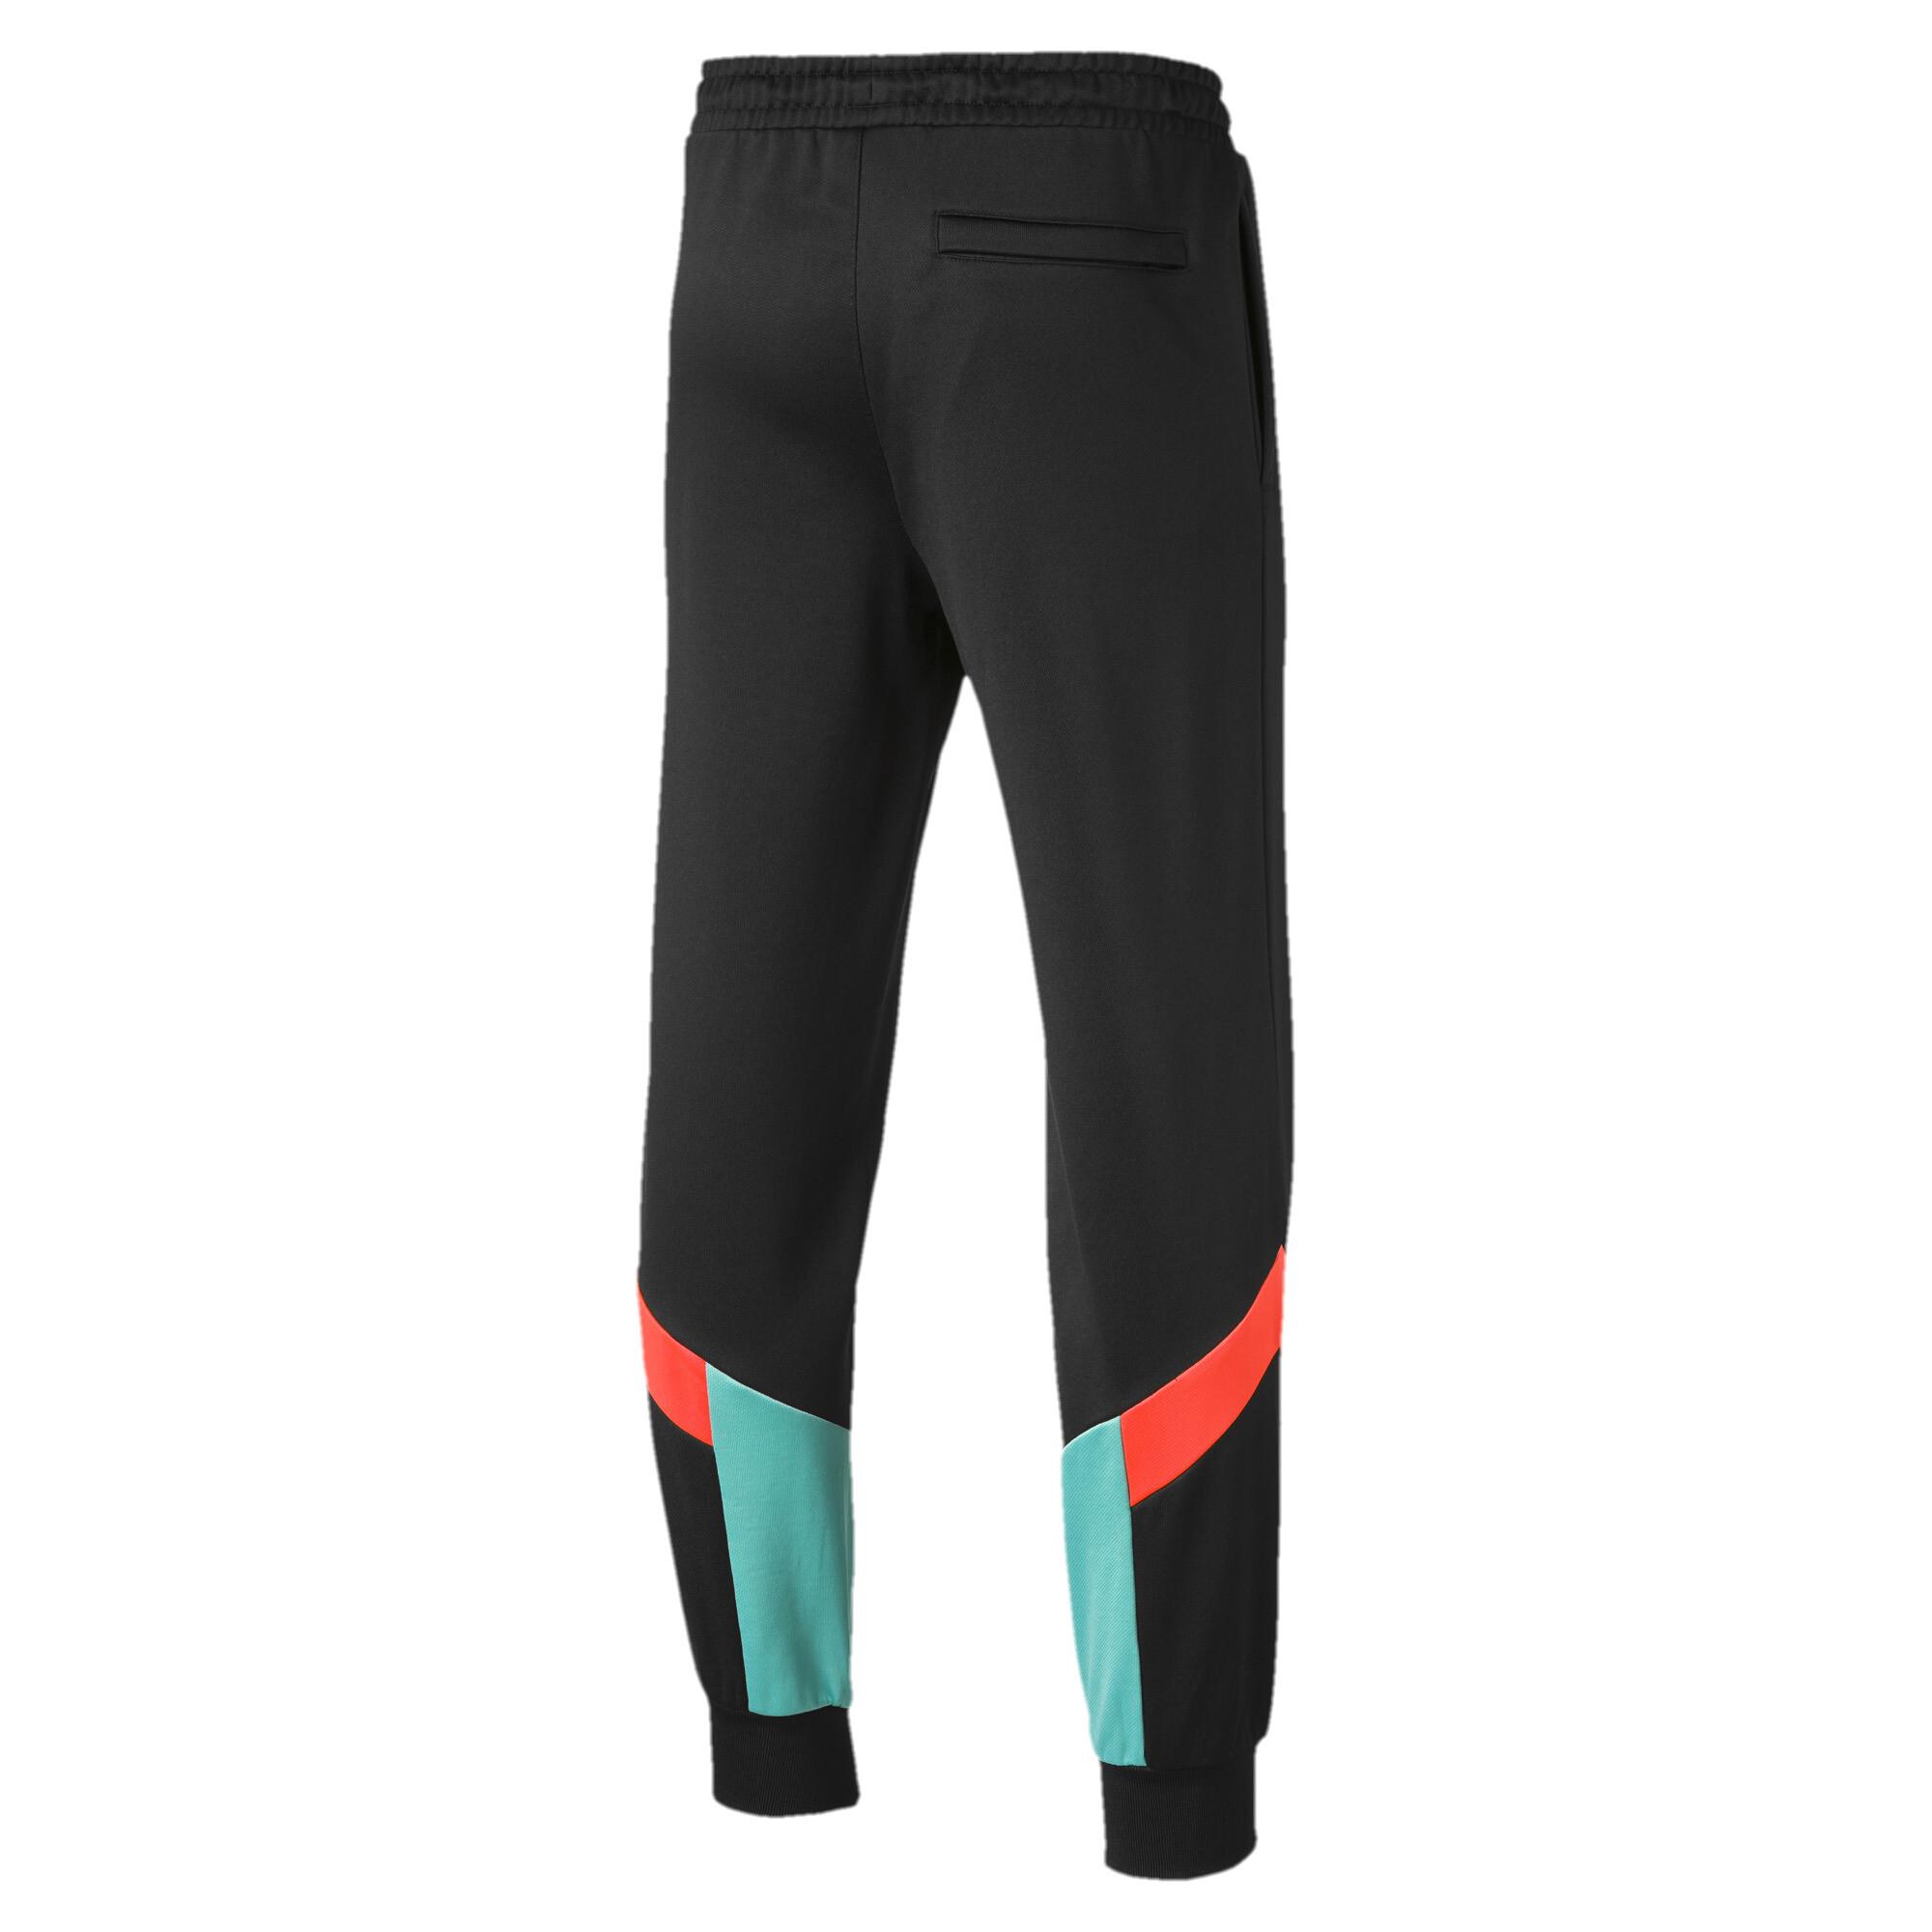 PUMA-Iconic-MCS-Men-039-s-Track-Pants-Men-Knitted-Pants-Sport-Classics thumbnail 14